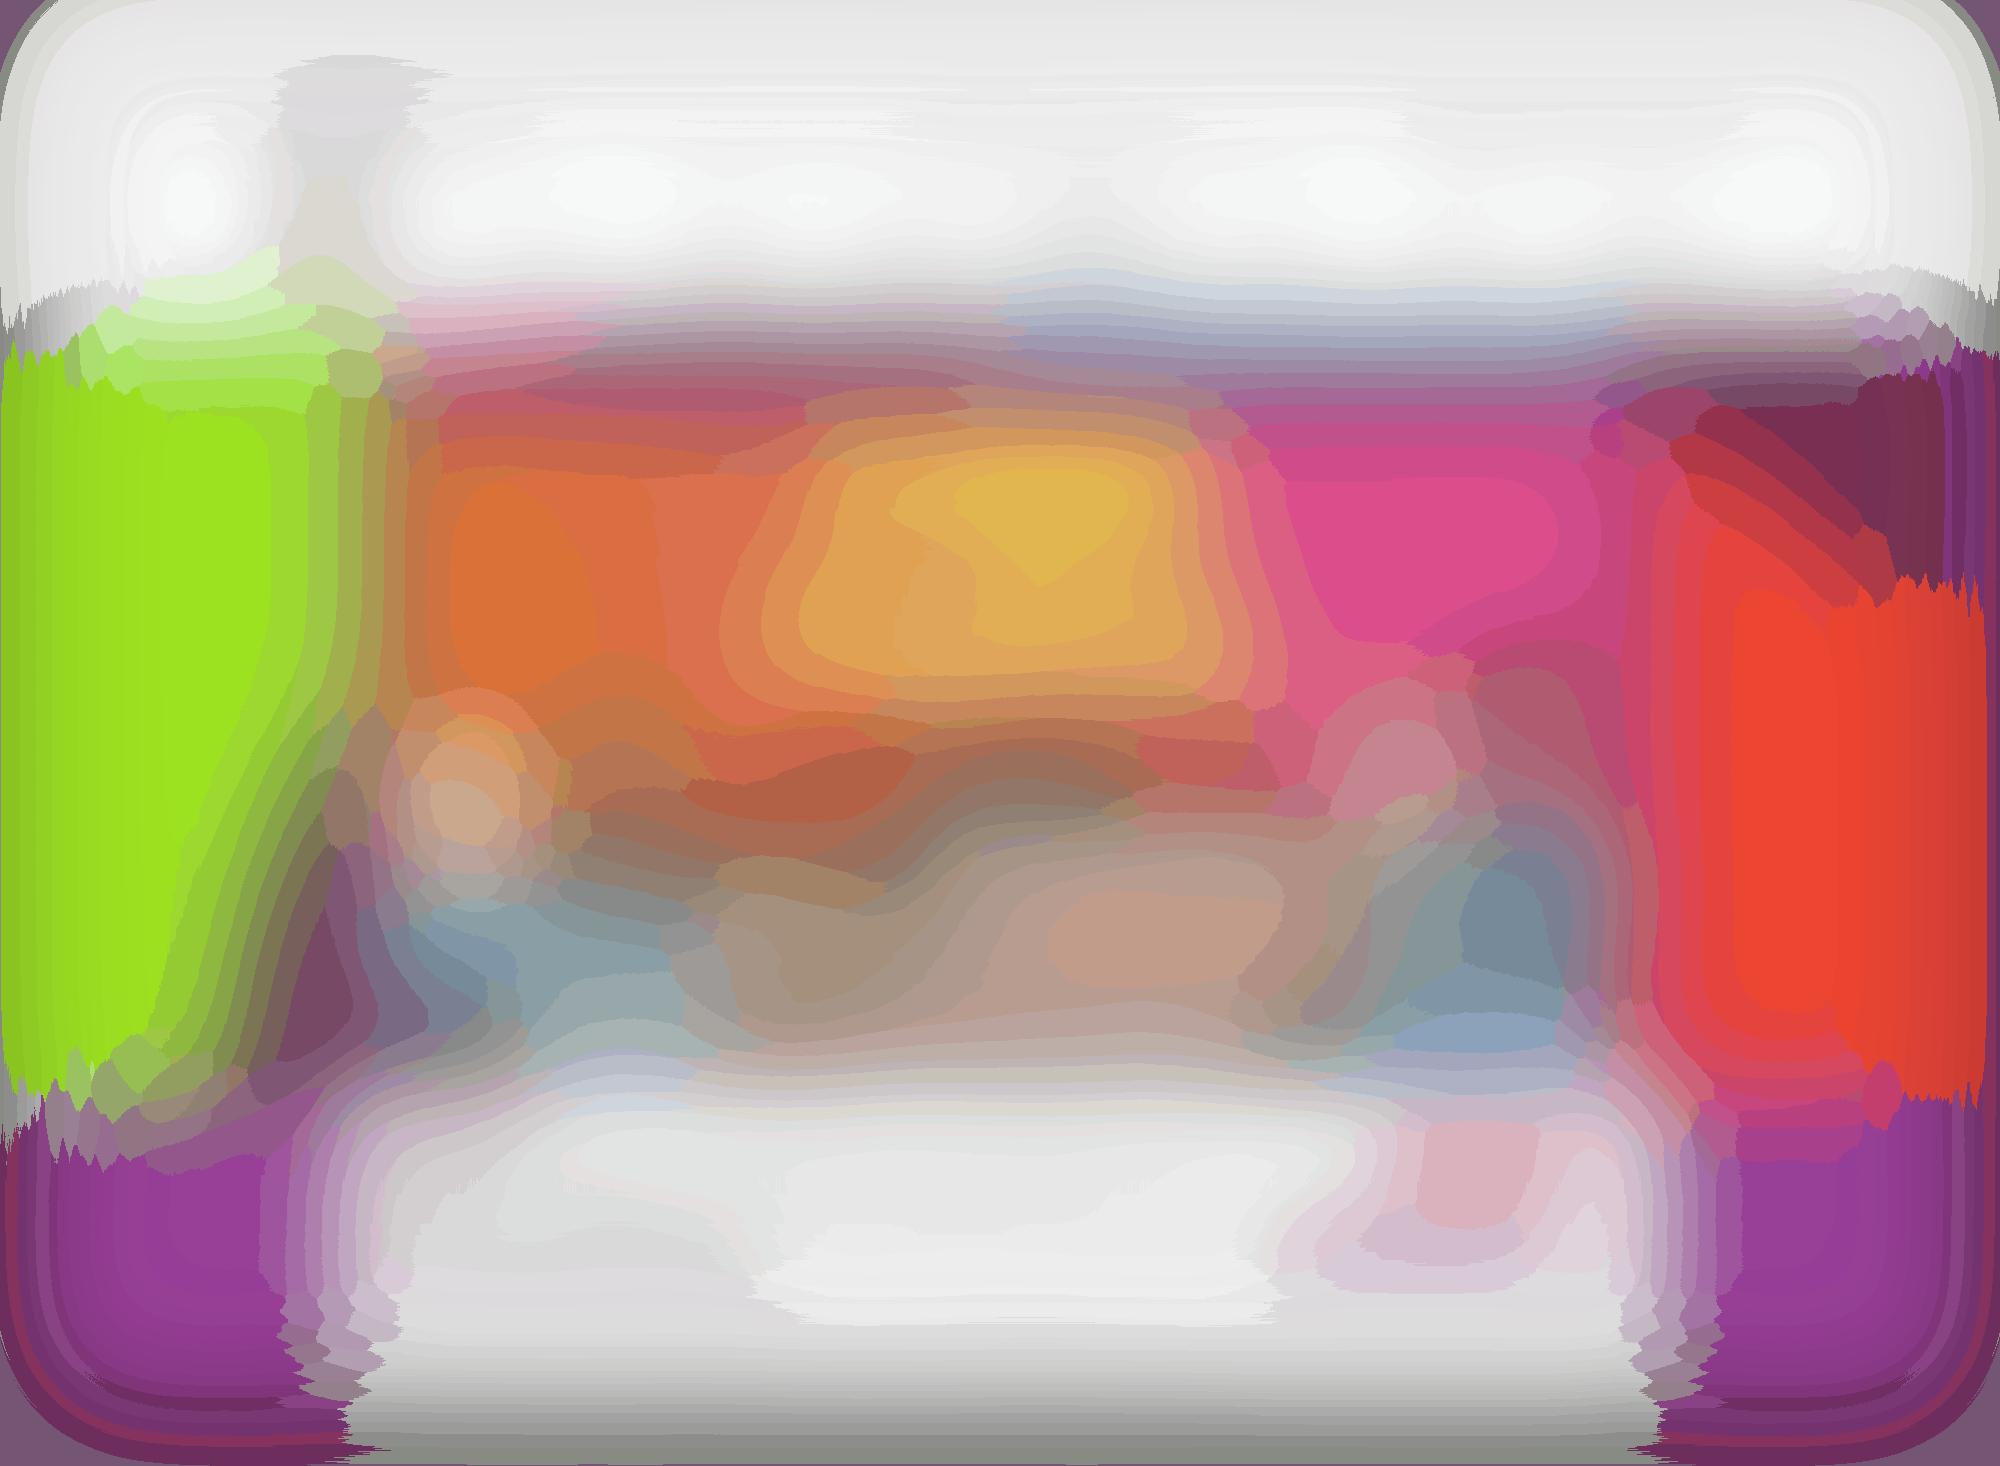 Screen Shot 2018 04 03 at 10 58 02 autocompressfitresizeixlibphp 1 1 0max h2000max w3 D2000q80s74f75e2a7fac4c2ce6b4600d37cf37d4